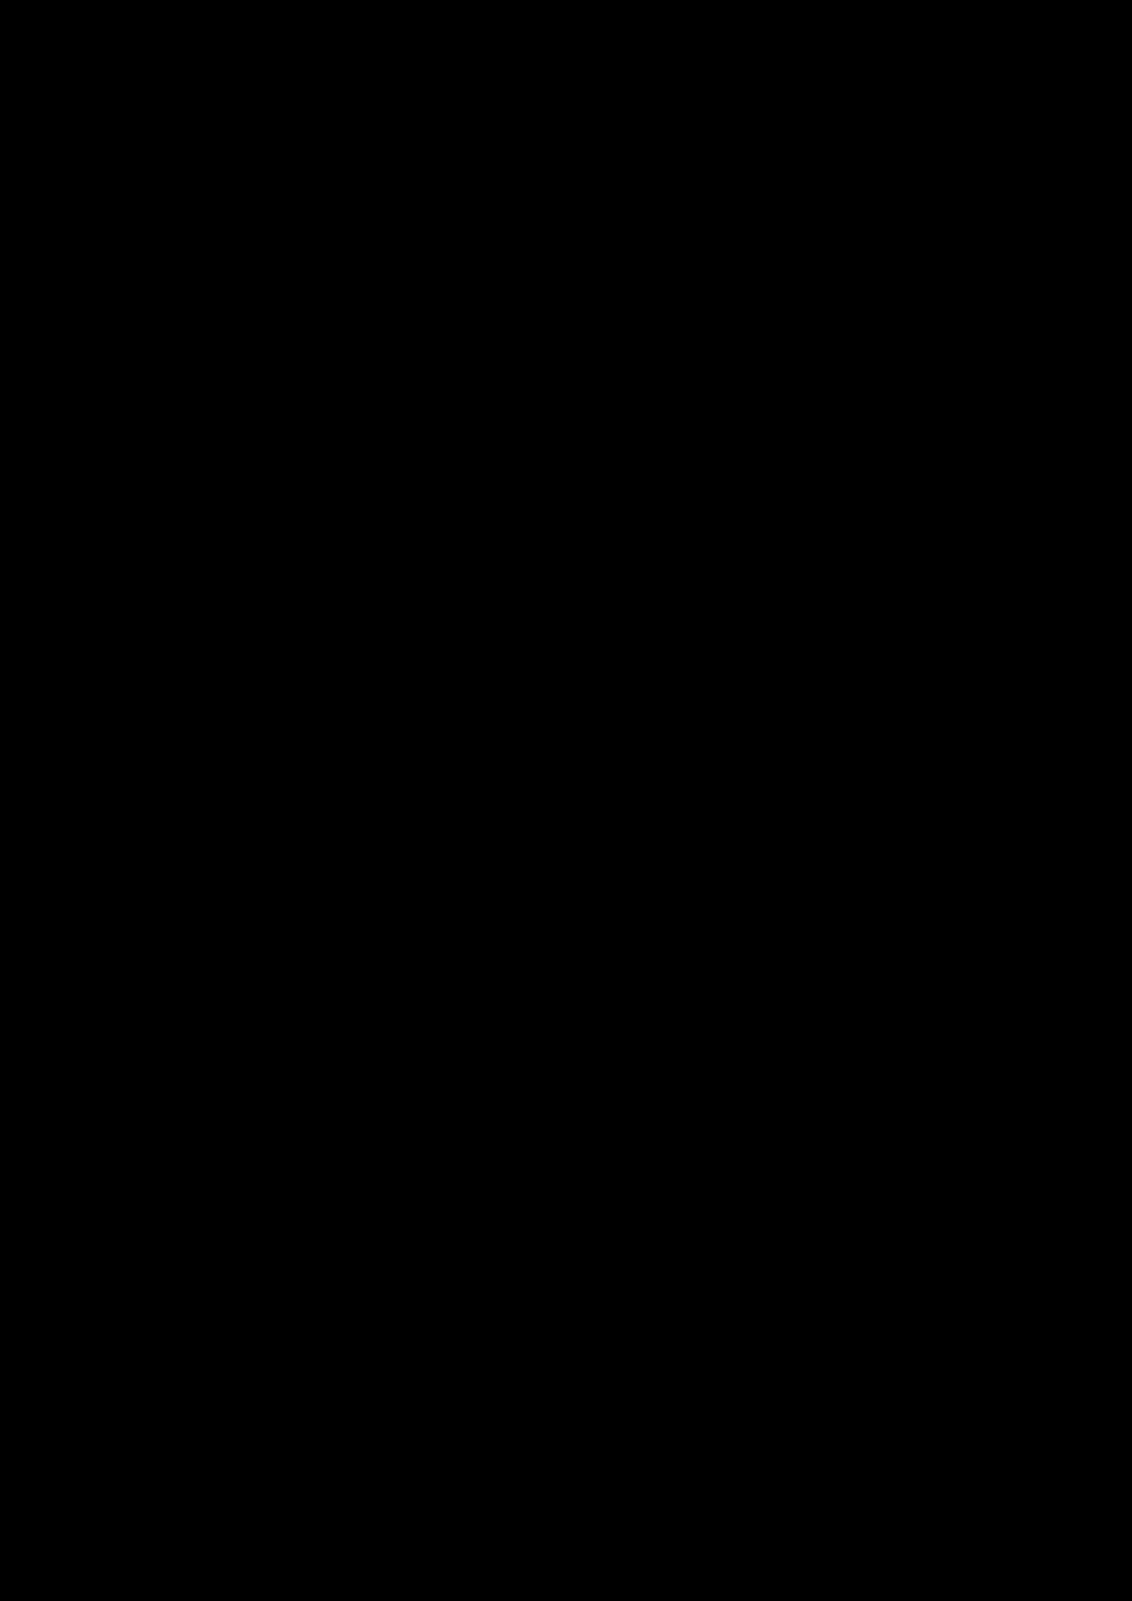 Ispoved Pervogo Boga slide, Image 42